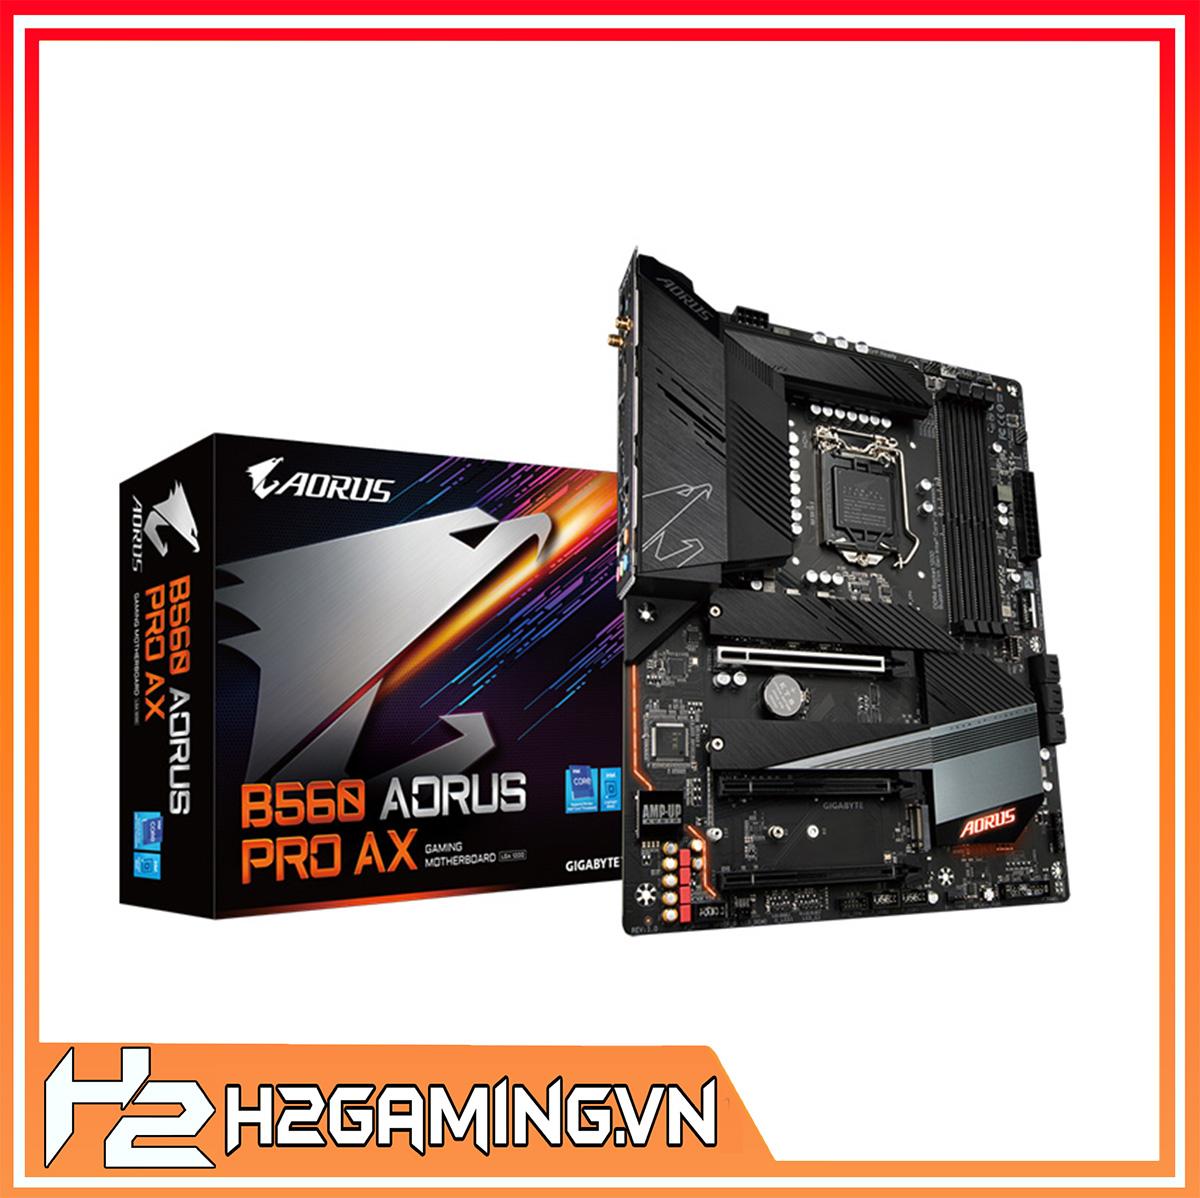 Mainboard_Gigabyte_B560-AORUS_PRO_AX_4